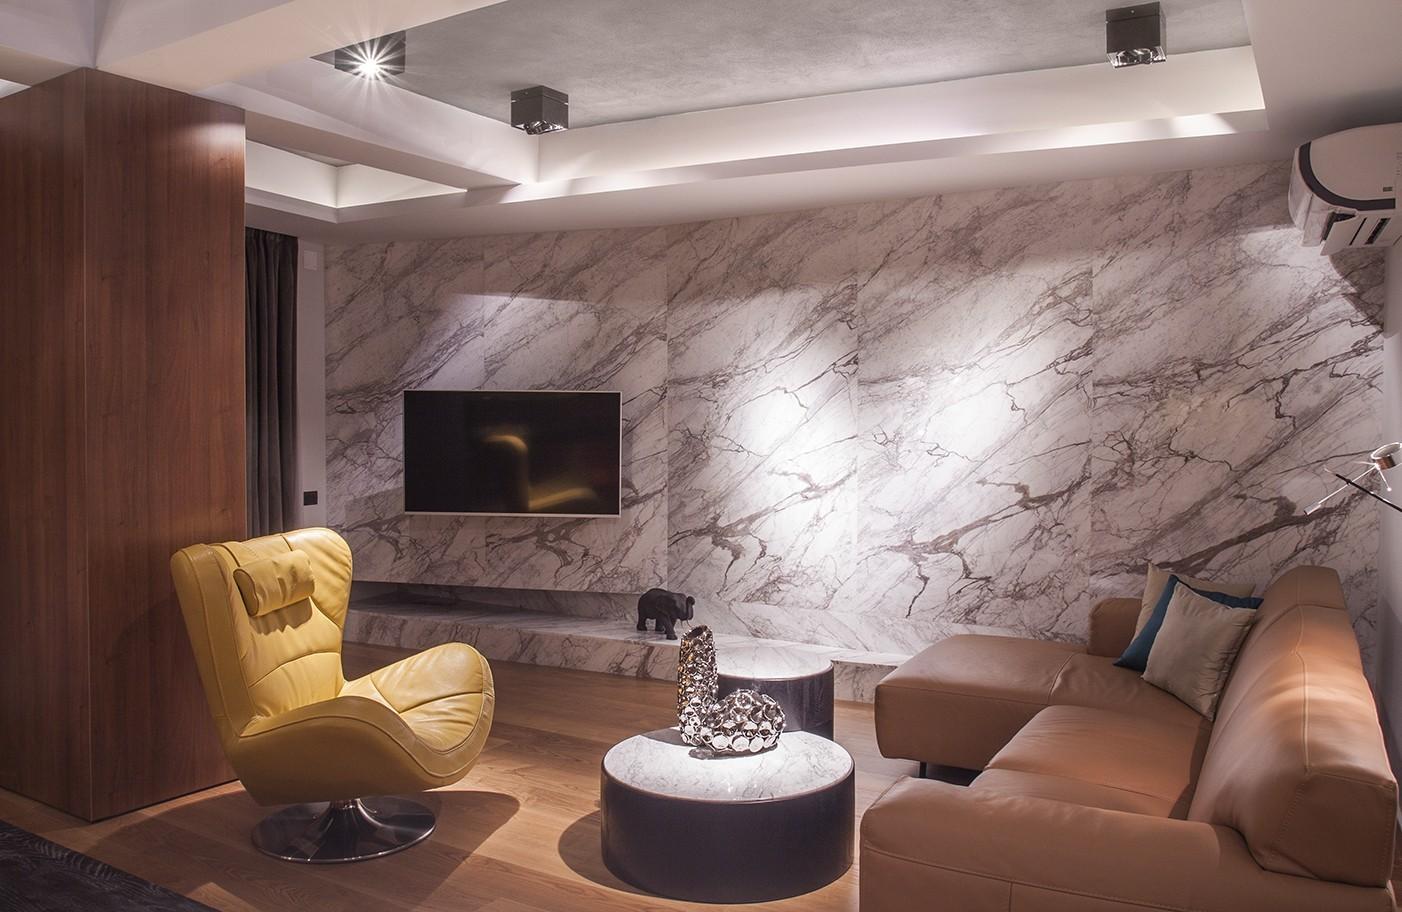 Modern minimalist living rooms - PIATRAONLINE.com